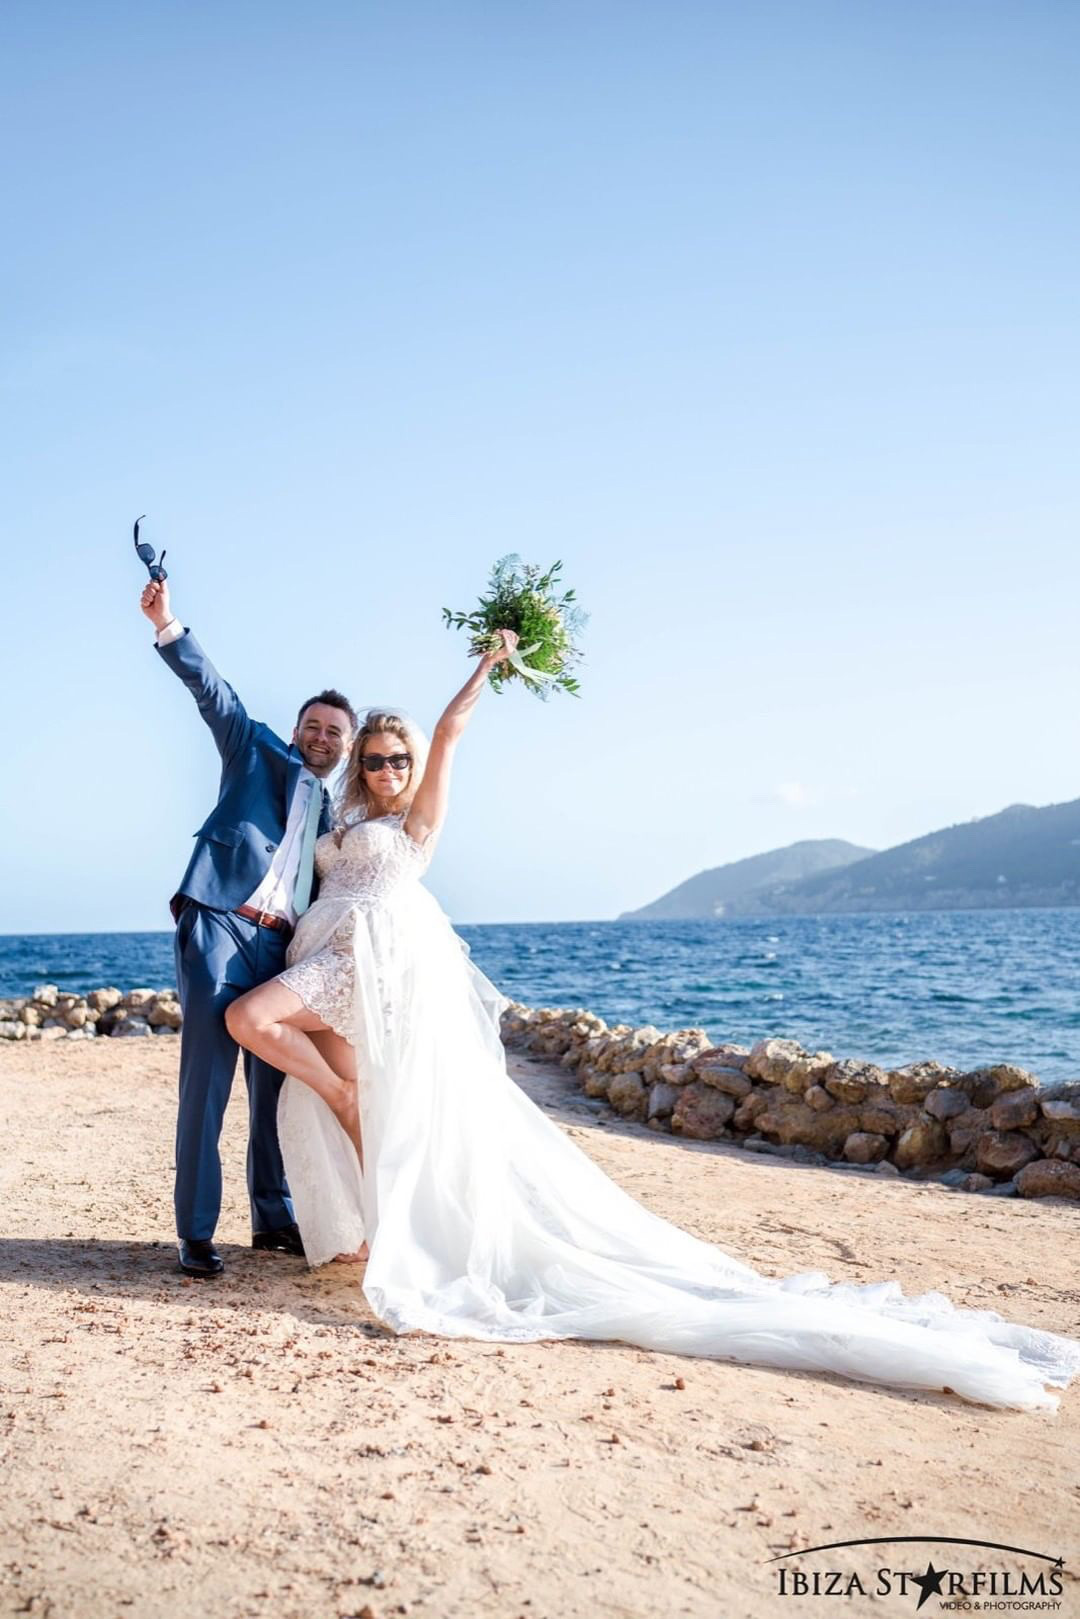 ibiza beach wedding bride and groom